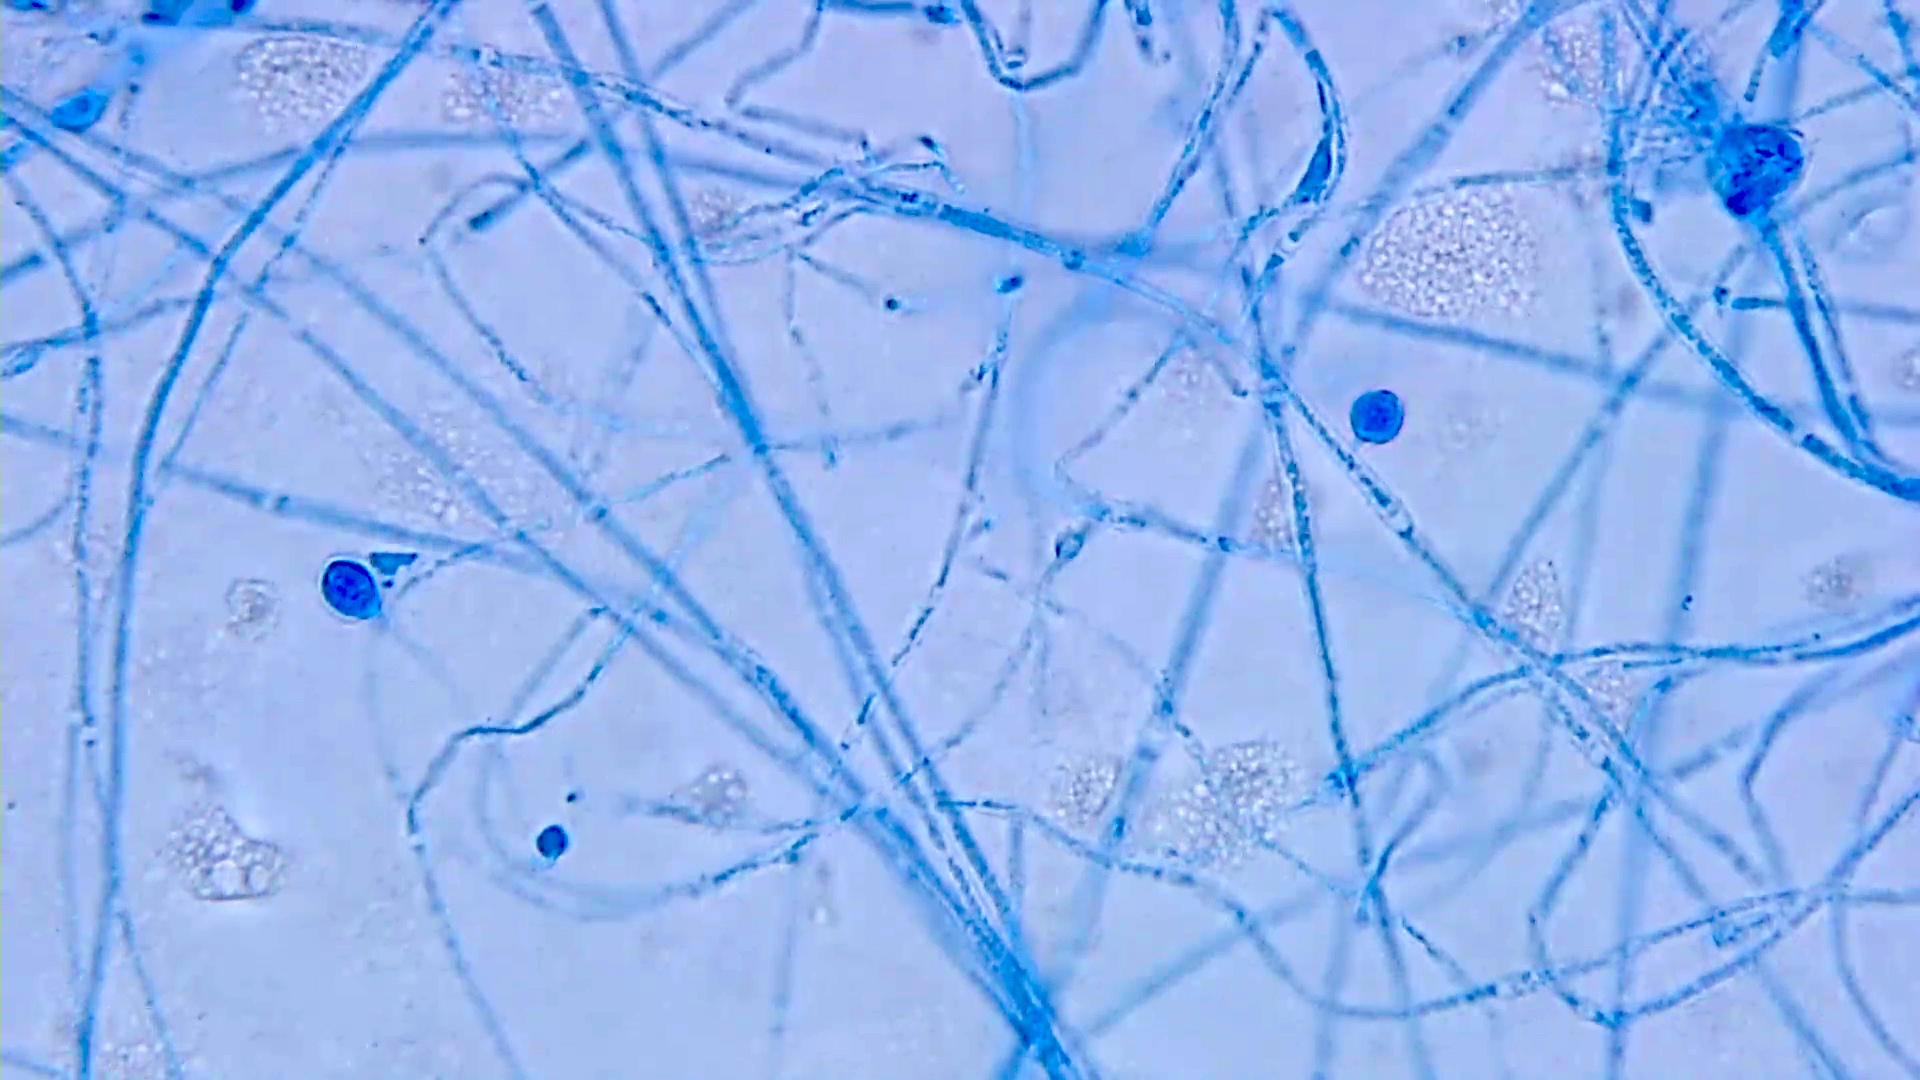 Lollipop aleurioconidia of Histoplasma